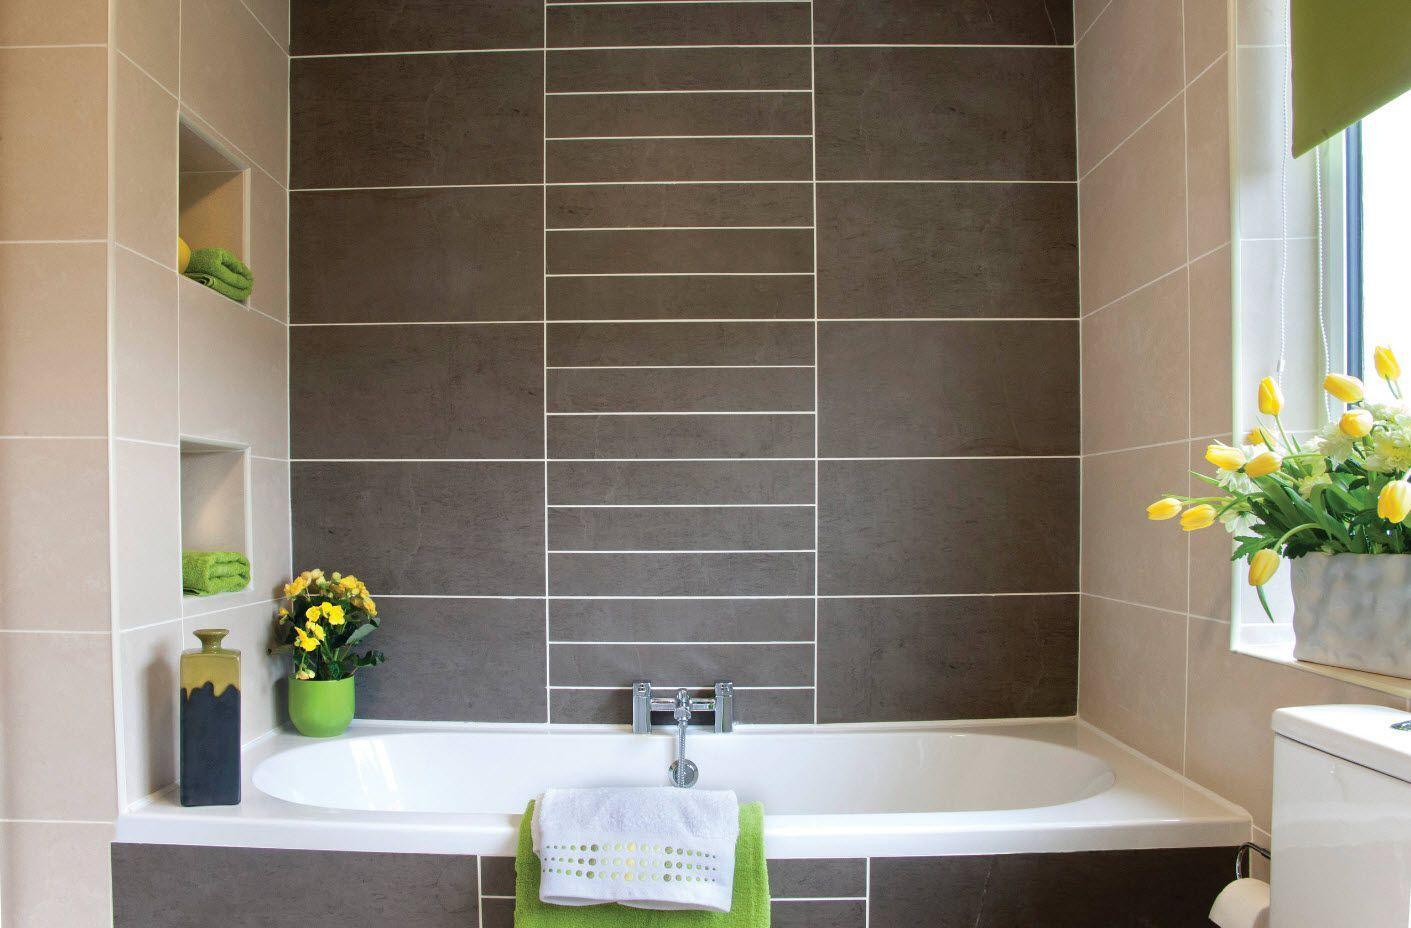 Dark marble surface in the ultramodern bathroom 2017with built up white acrylic bathtub